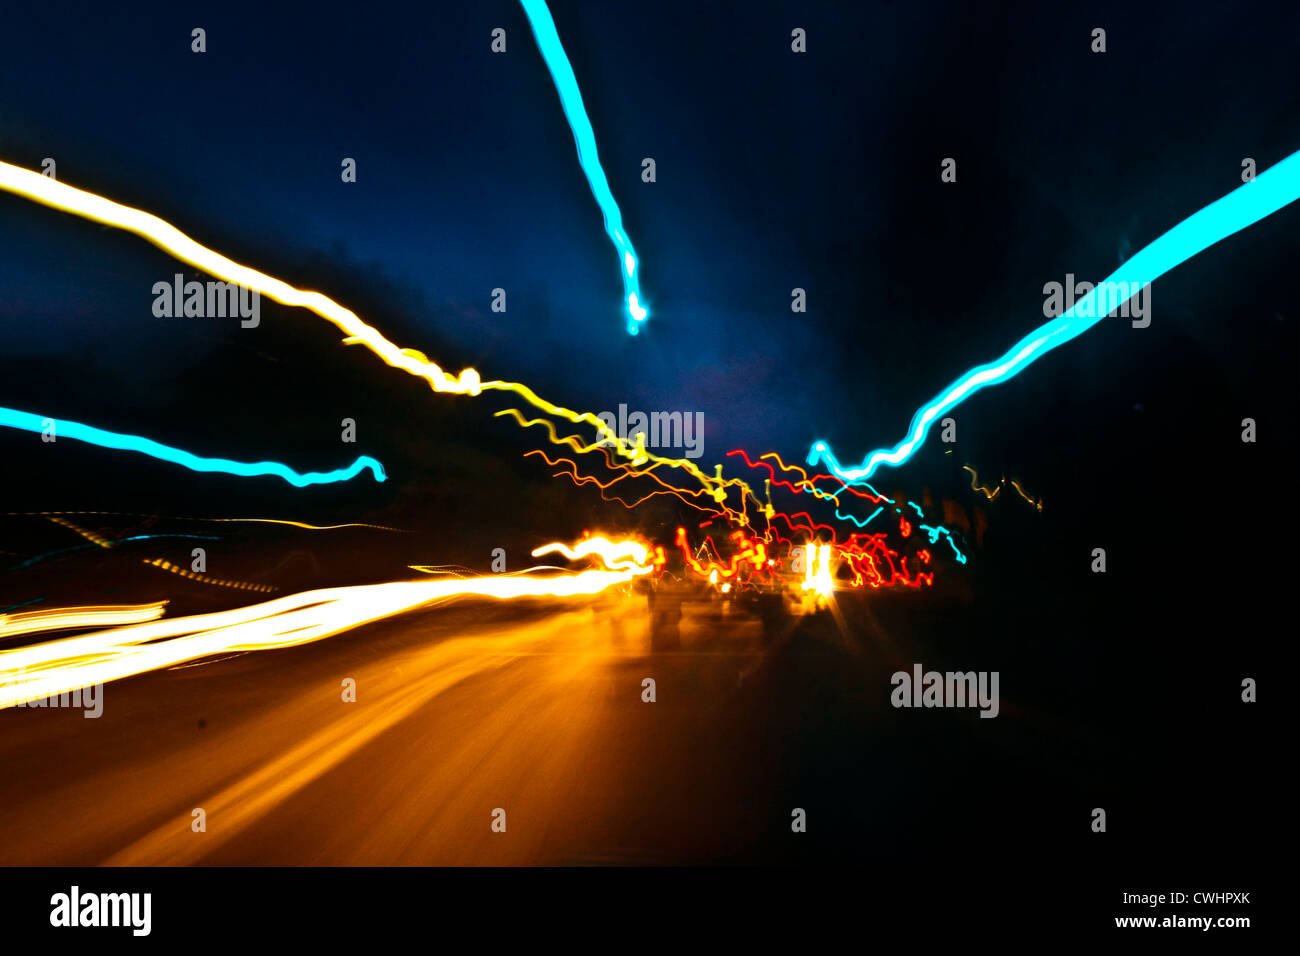 Lampen, Schienensysteme Stockbild